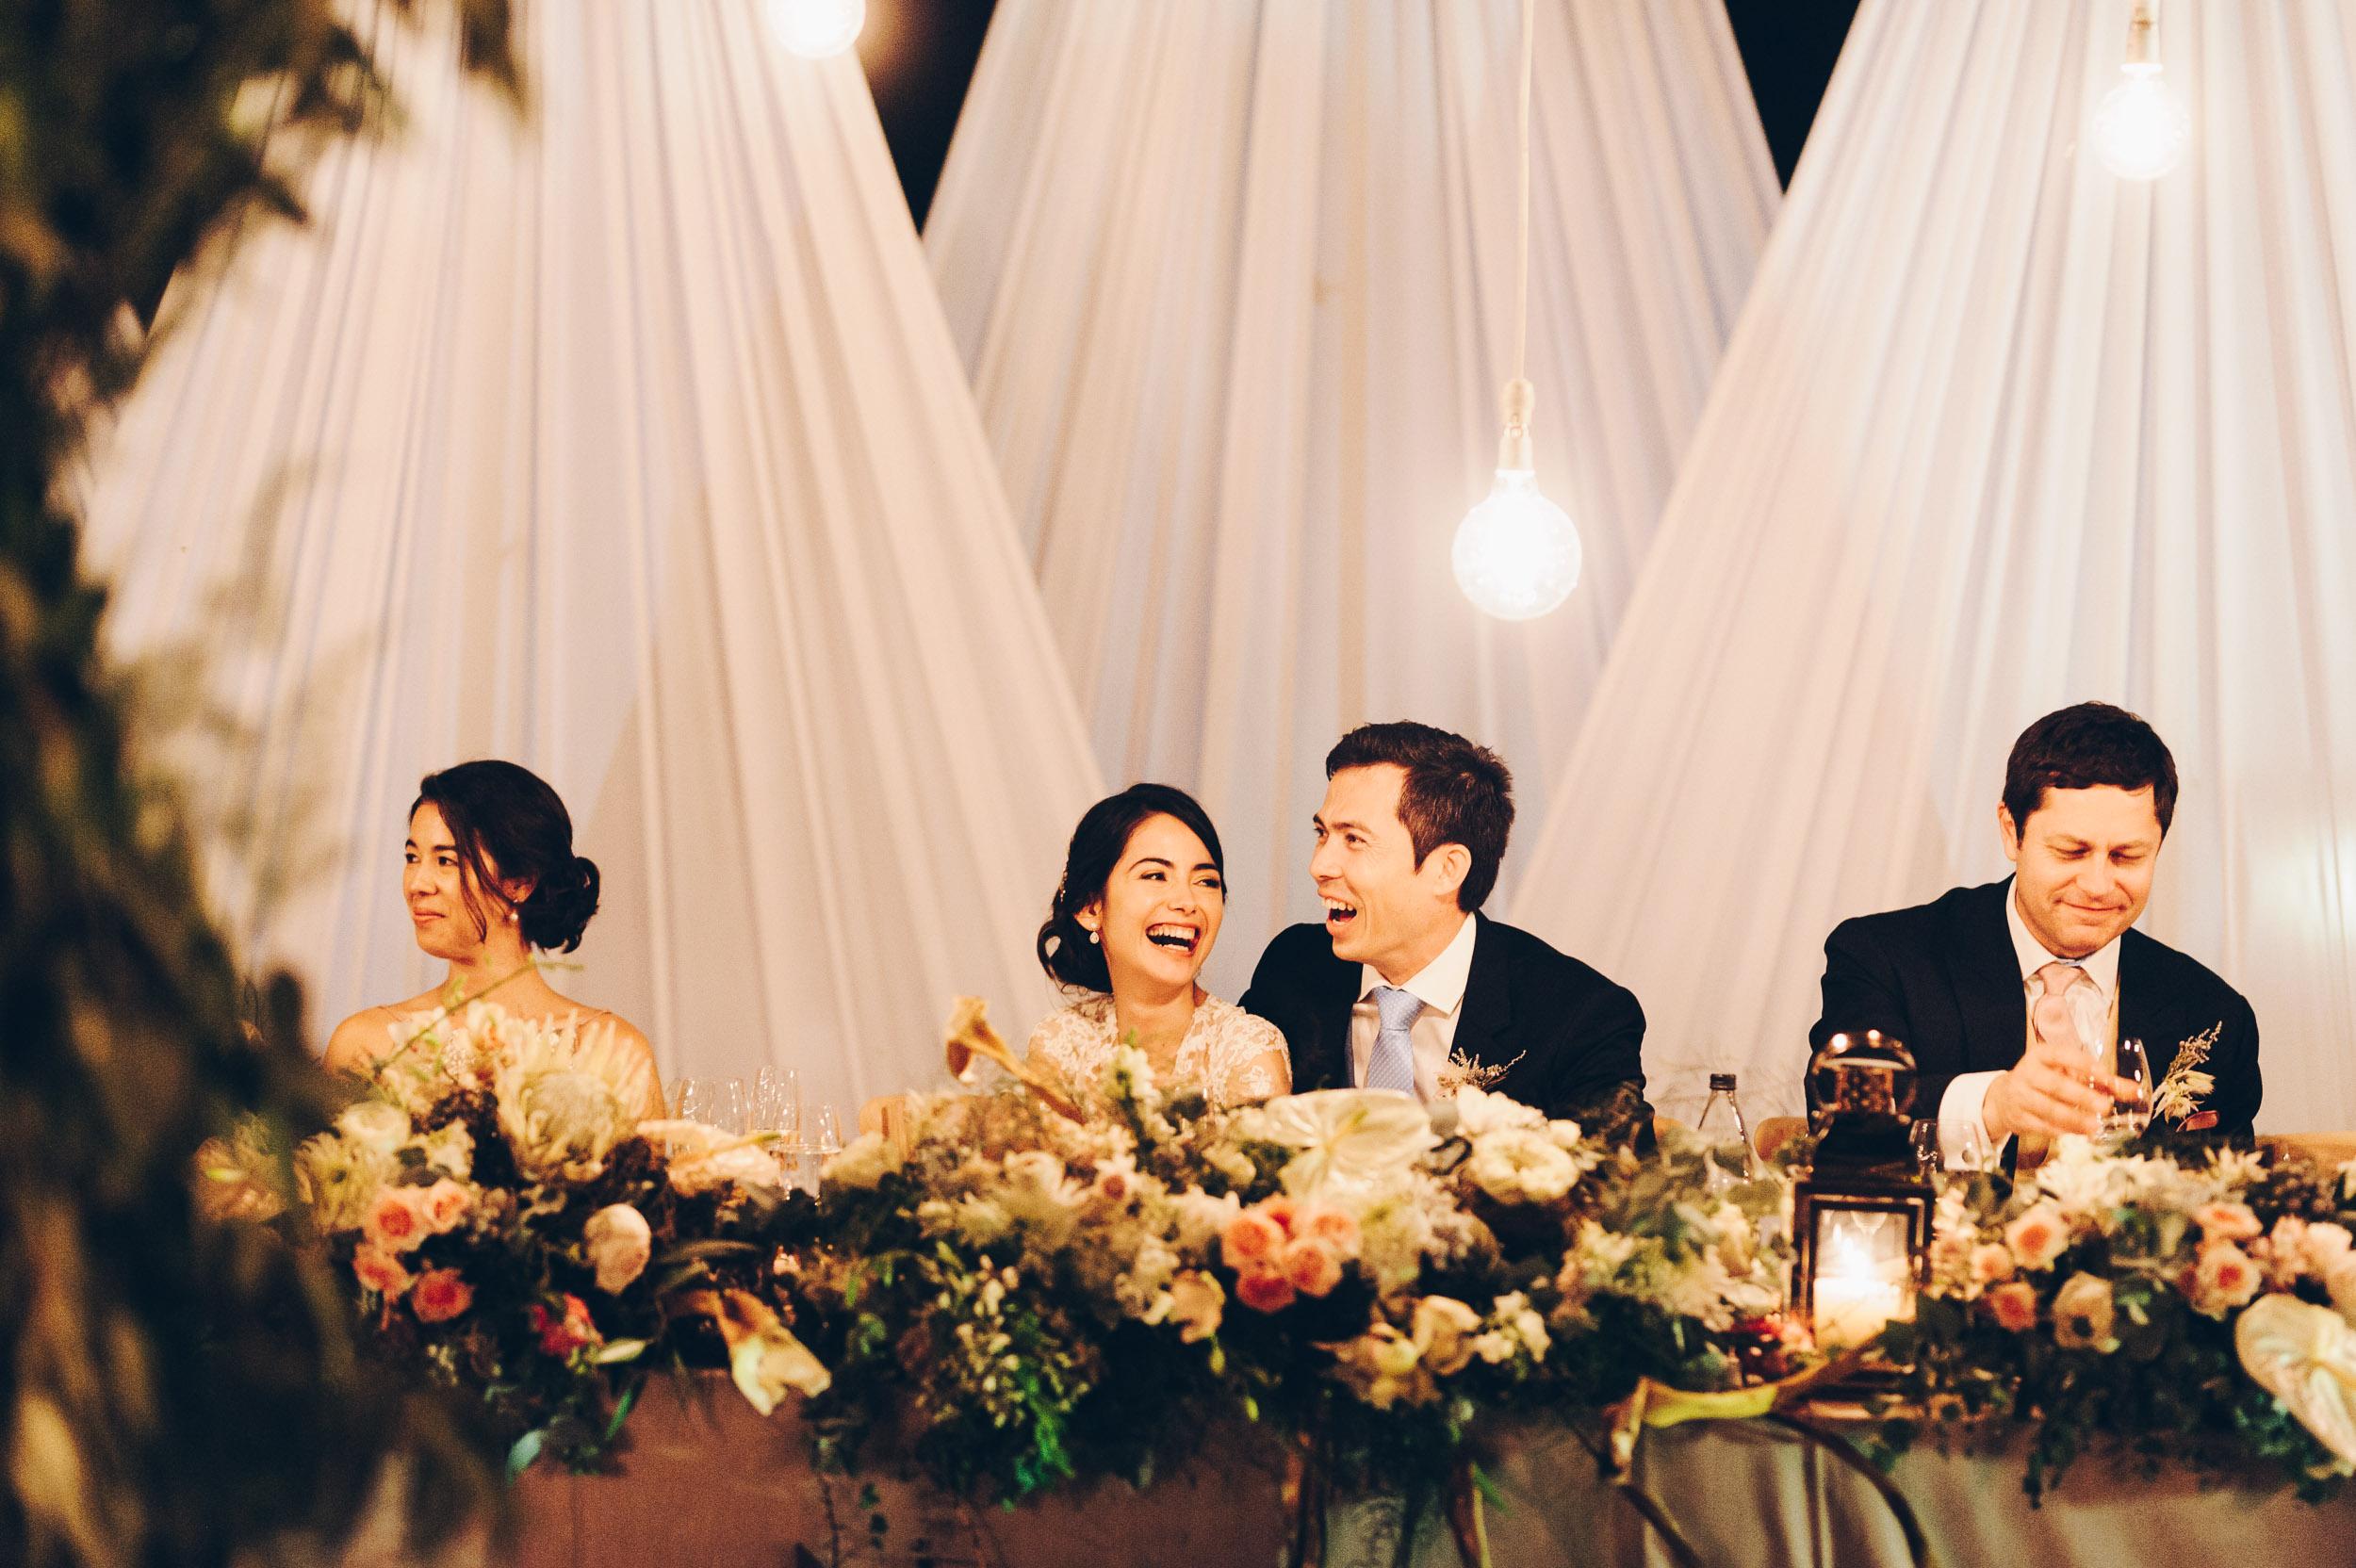 Jenny-Rockett-John-Scranton-Cape-Town-Wedding-Photographer-Andrea-Kellan-214.jpg